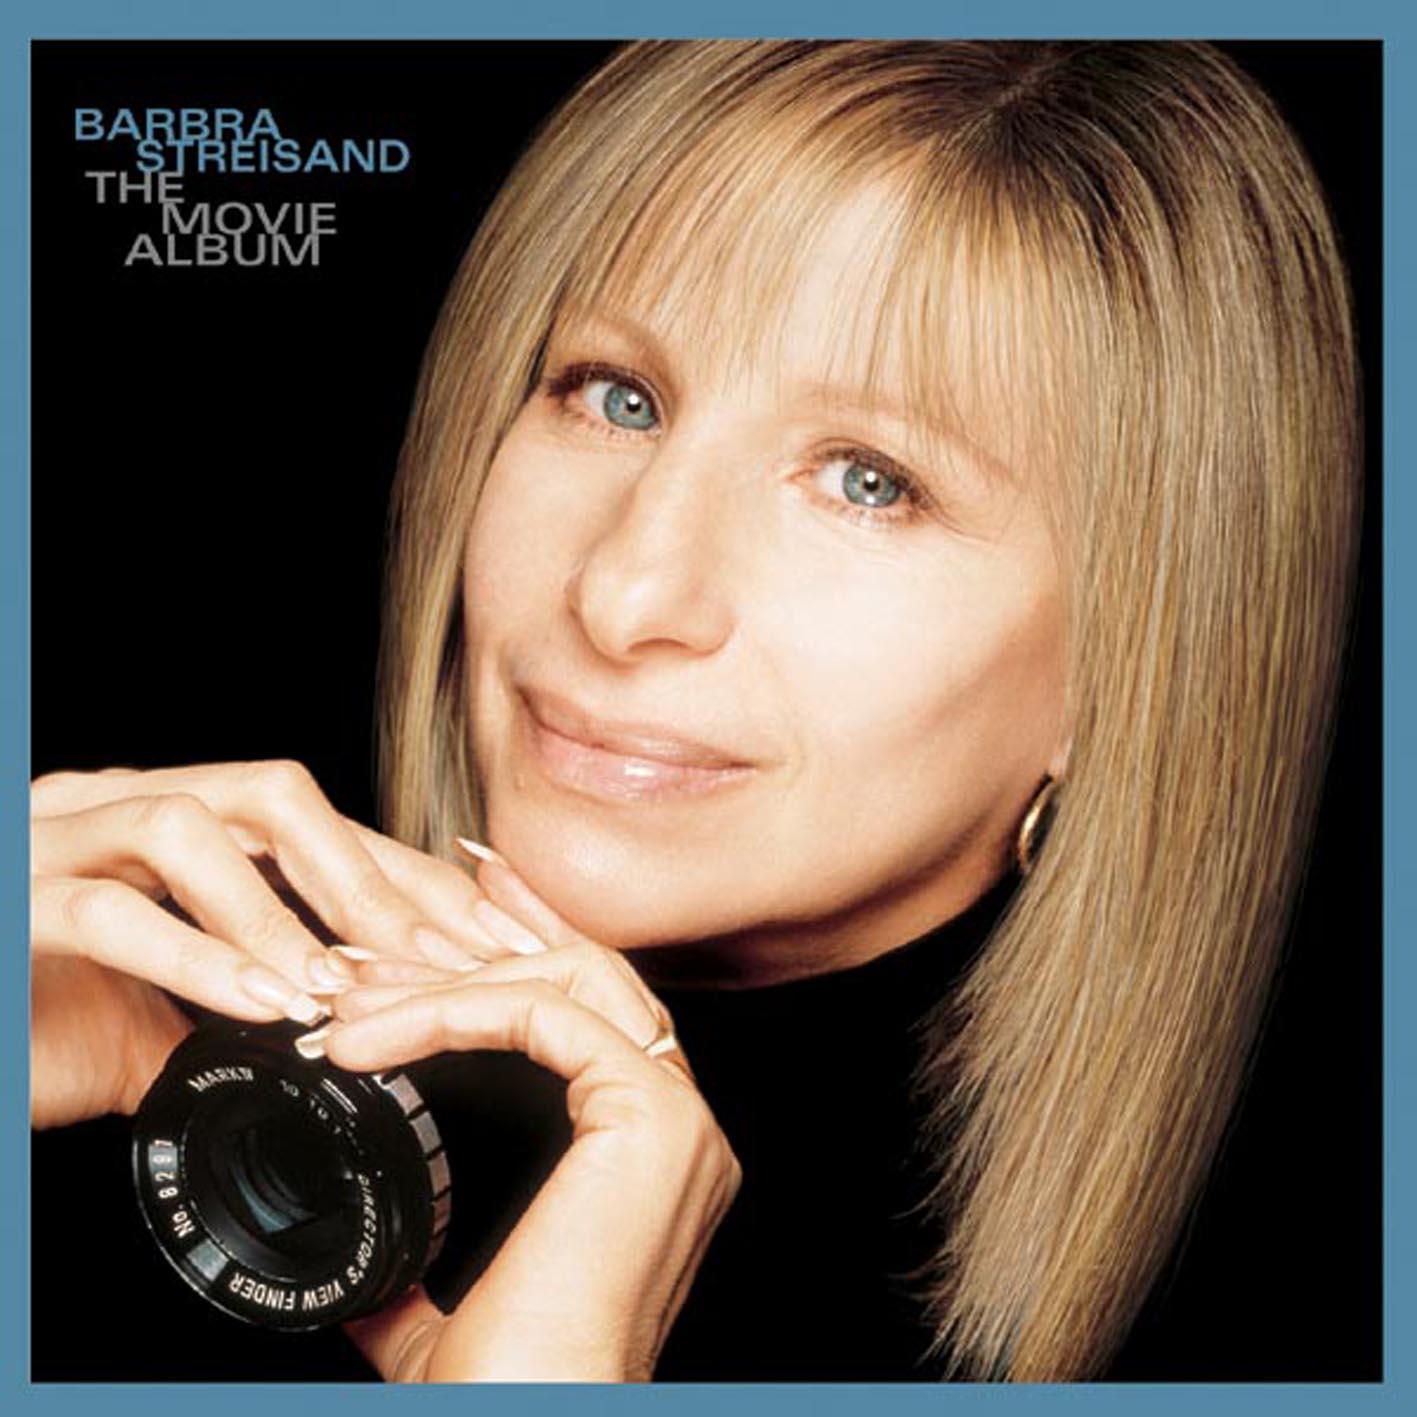 http://3.bp.blogspot.com/-eYkYgQlBcSY/TawHNIITOhI/AAAAAAAAAWc/AbMaIXotl_s/s1600/Barbra-Streisand-1.jpg#Barbara%20Streisand%201417x1417